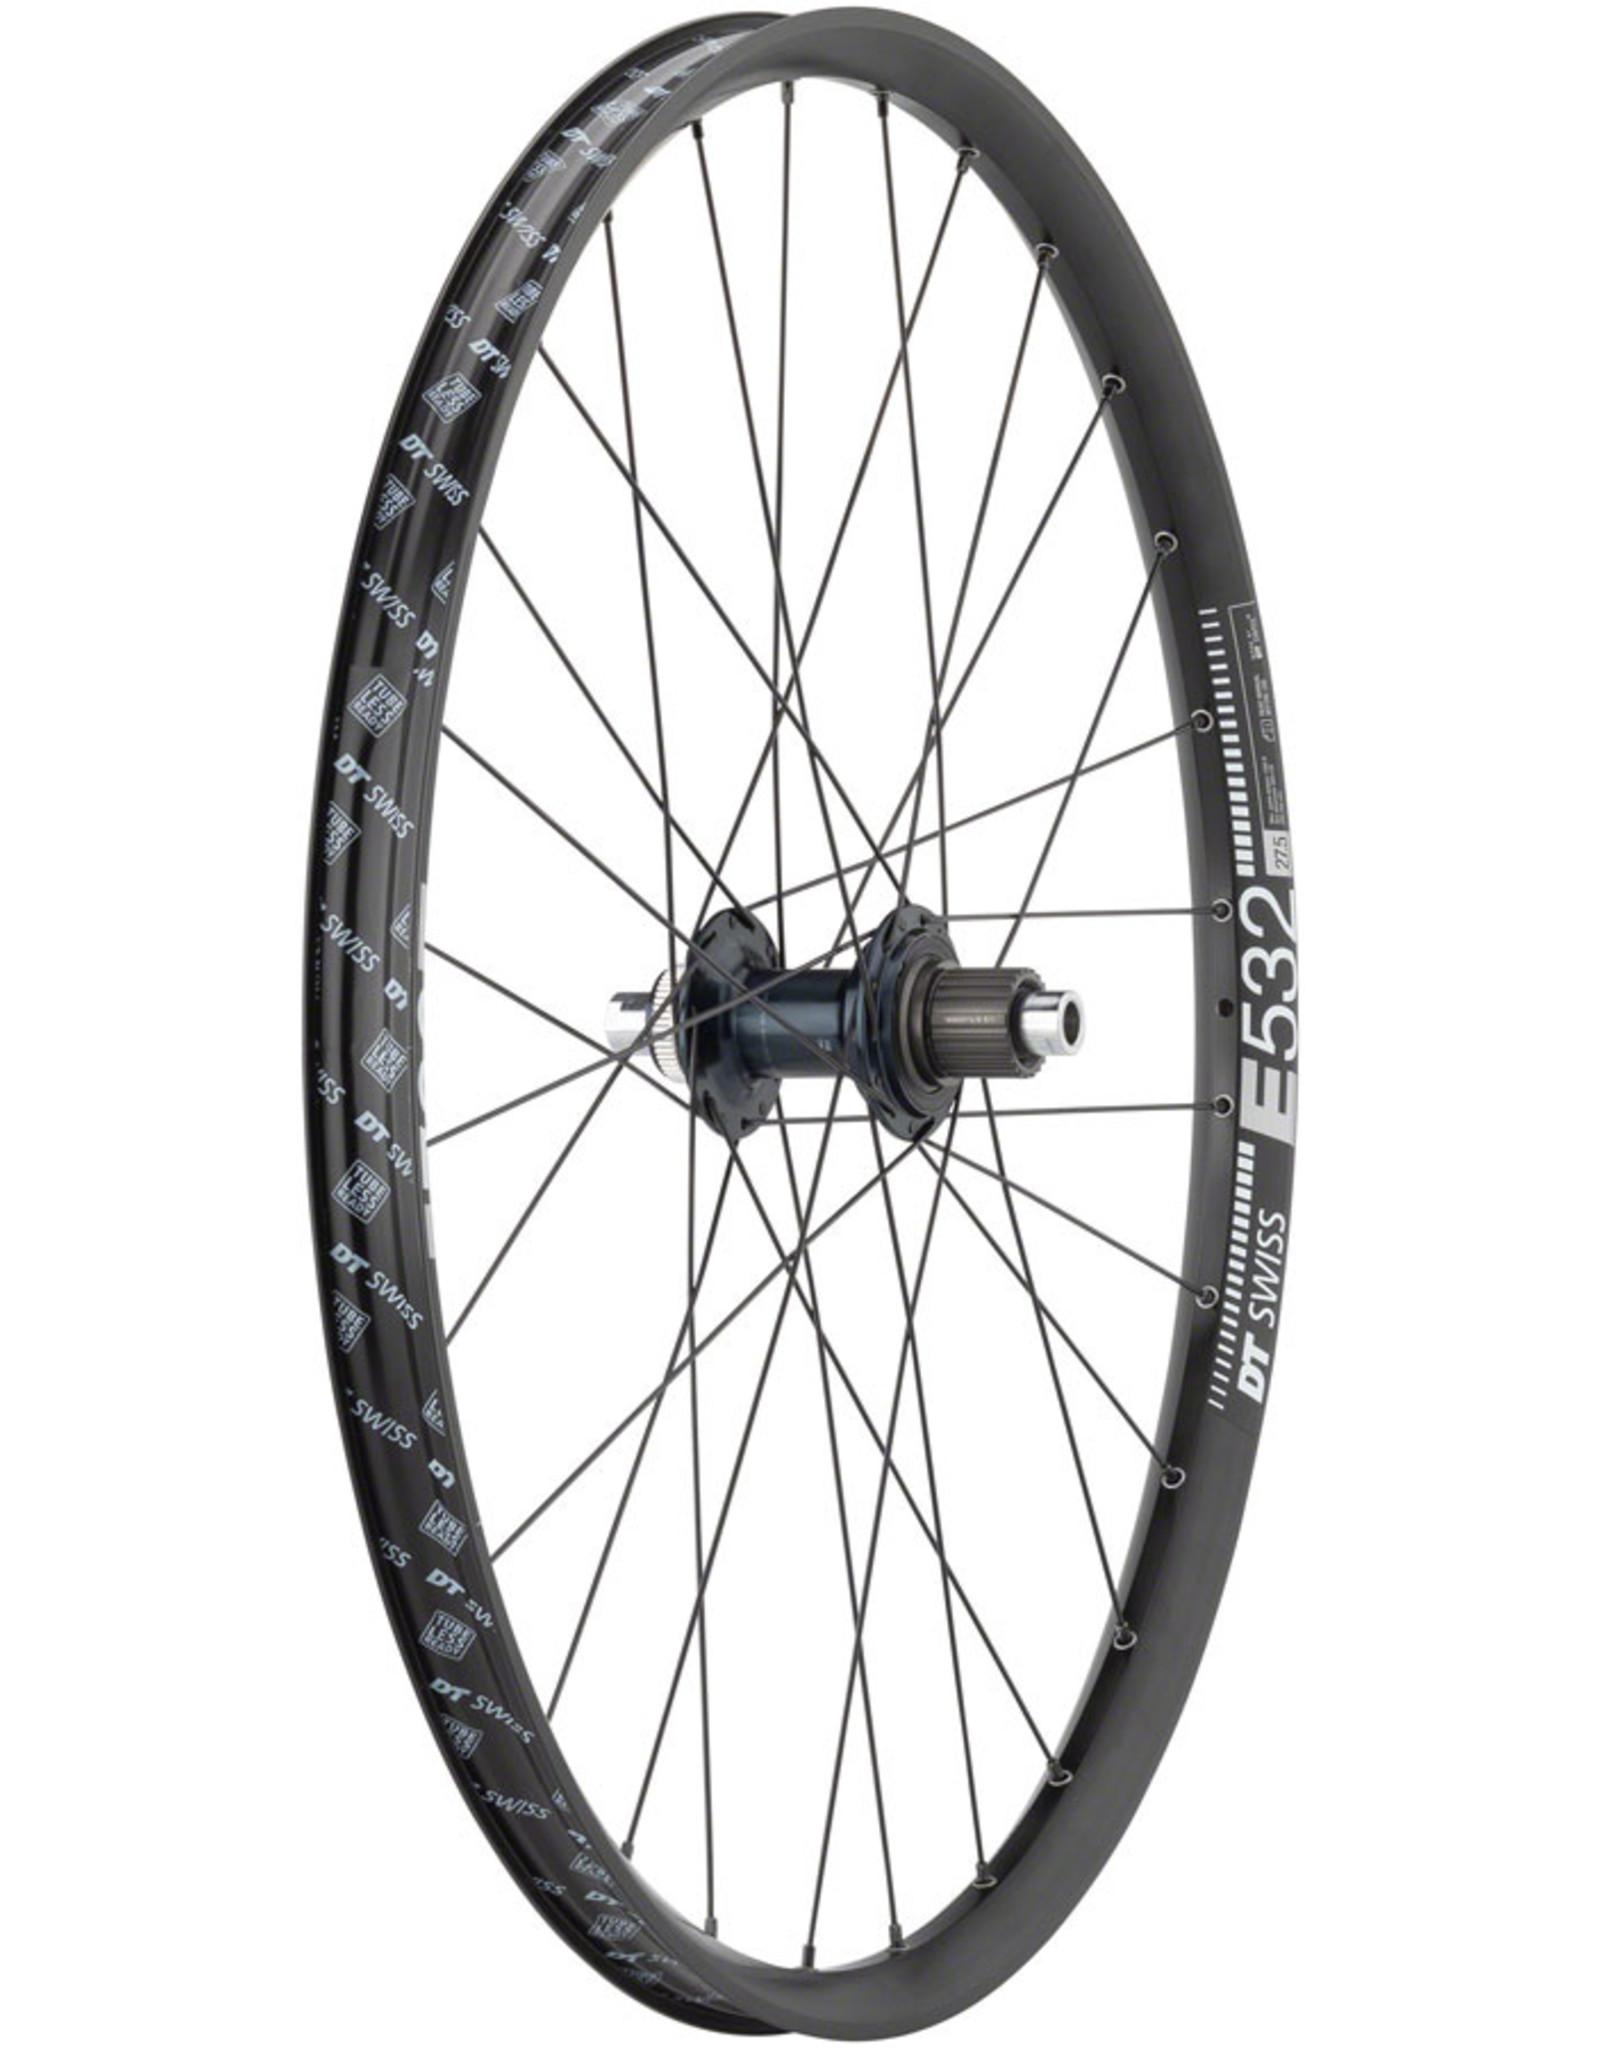 "Quality Wheels Shimano SLX/DT E532 Rear Wheel - 27.5"", 12 x 148mm, Center-Lock, Micro Spline, Black"